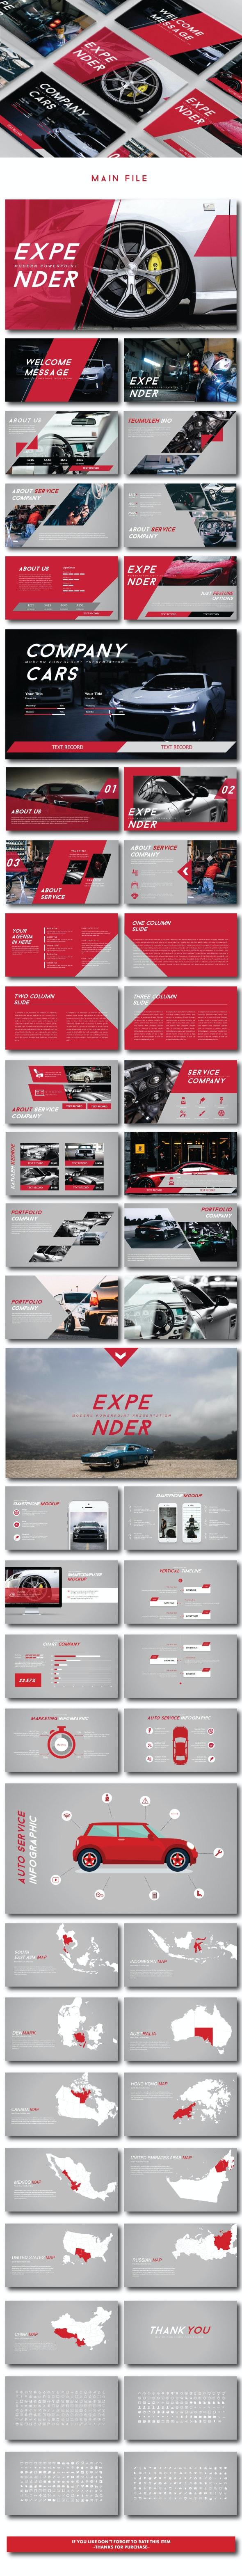 Expender Modern PPTX - Creative PowerPoint Templates